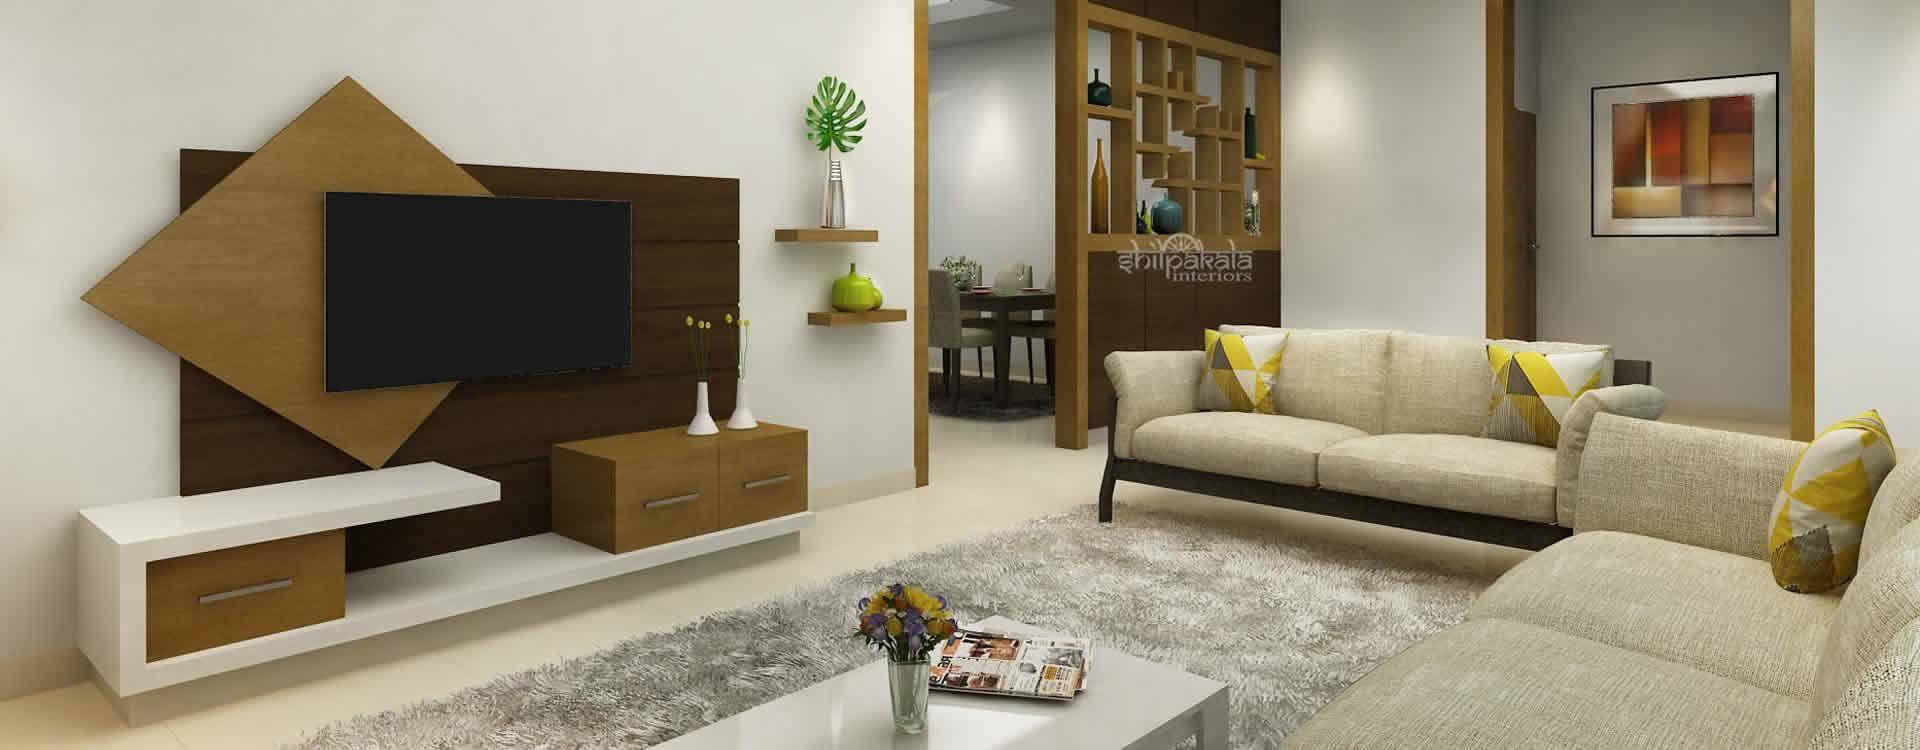 Interior Designers In Kochi Best Home Design Companies In Kerala Hall Interior Design Kitchen Interior Design Modern Home Office Design